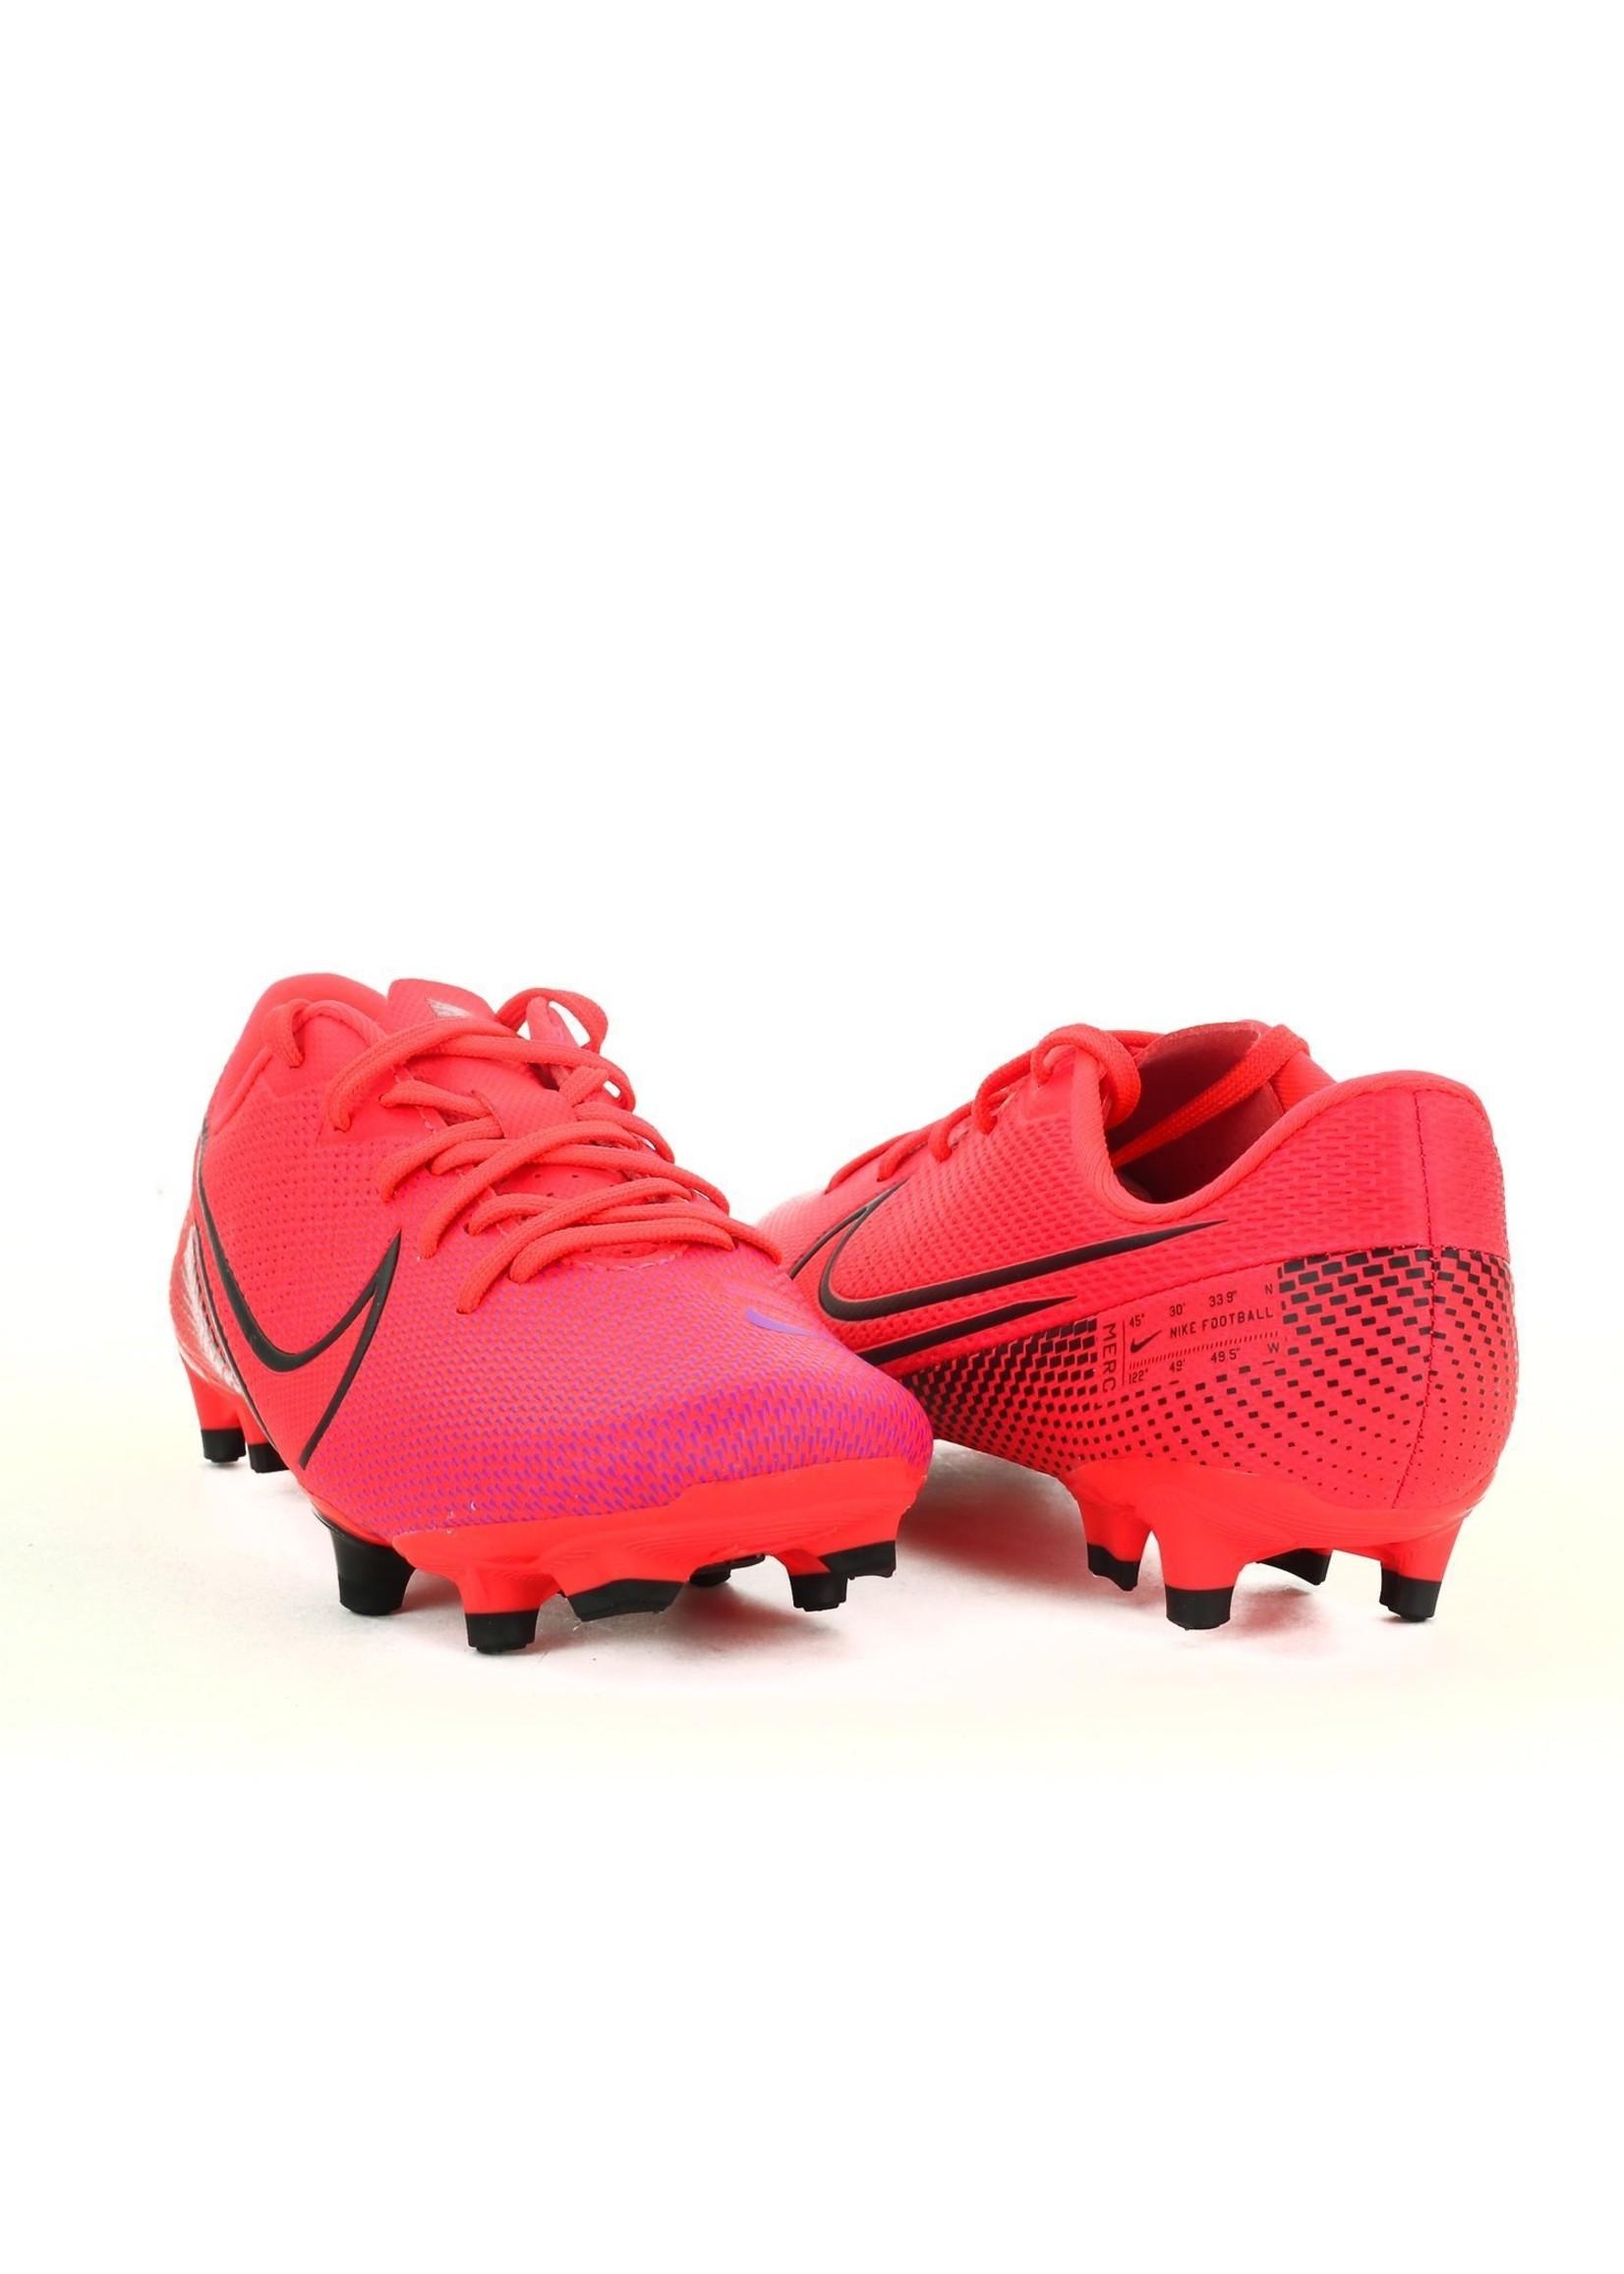 Nike JR VAPOR 13 ACADEMY FG/MG